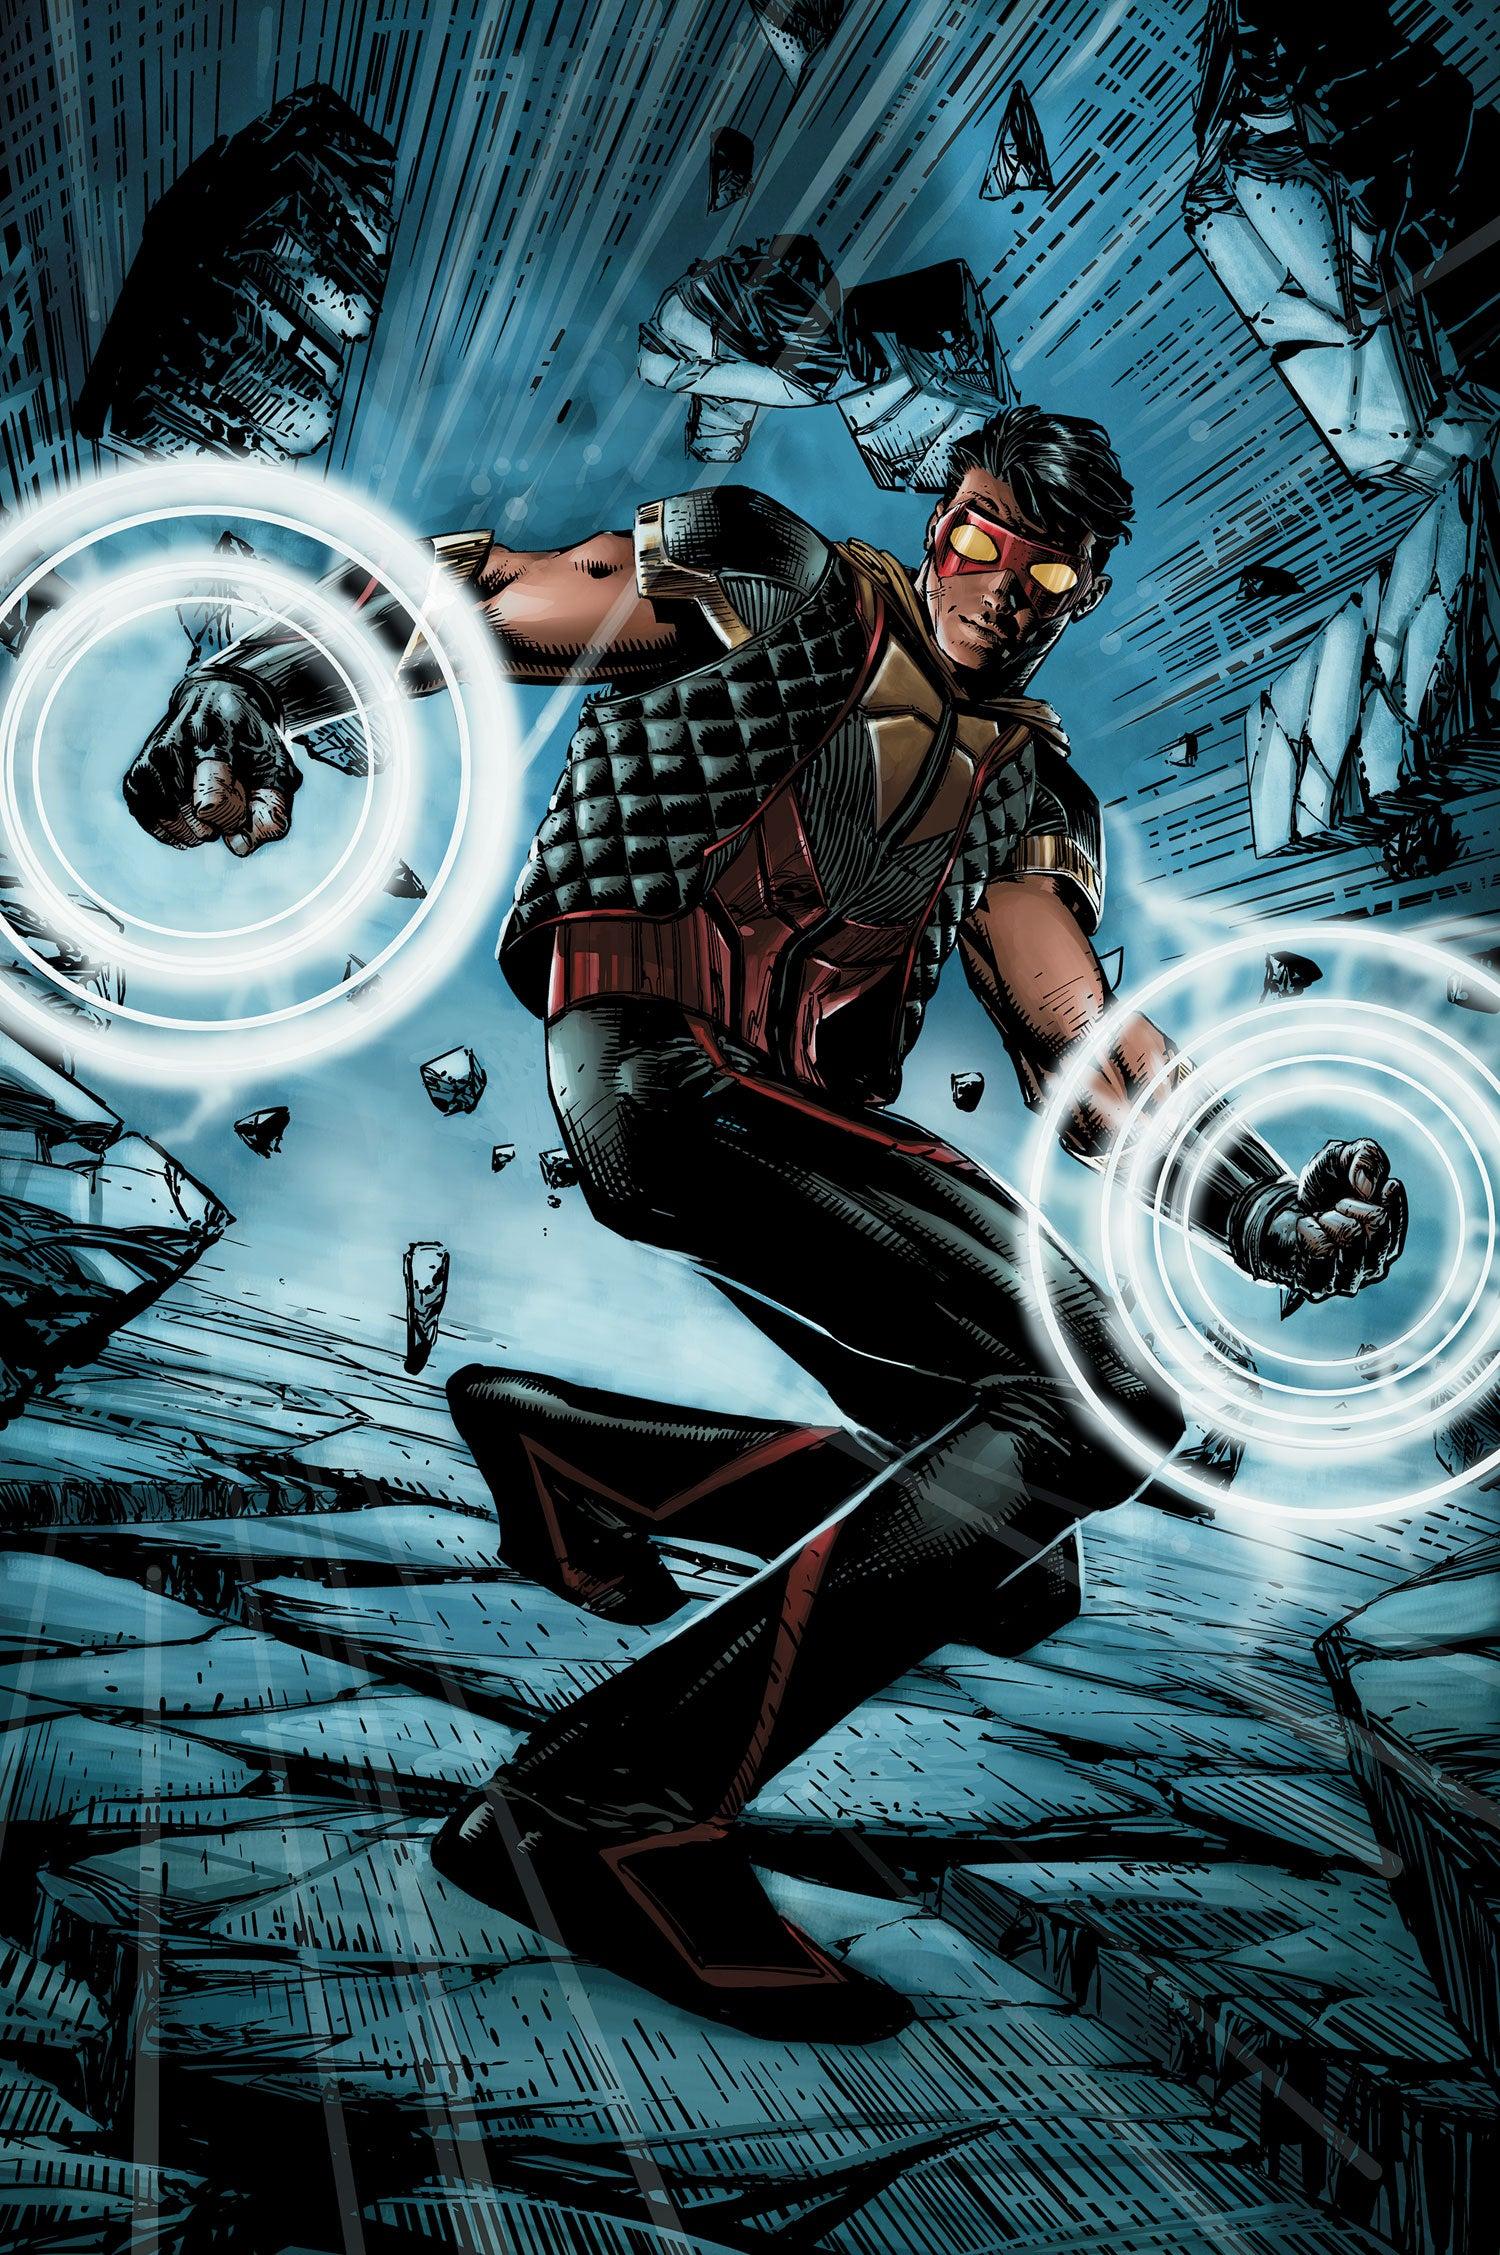 Arrow/Flash Concept: Vibe by IronAvenger1234 on DeviantArt